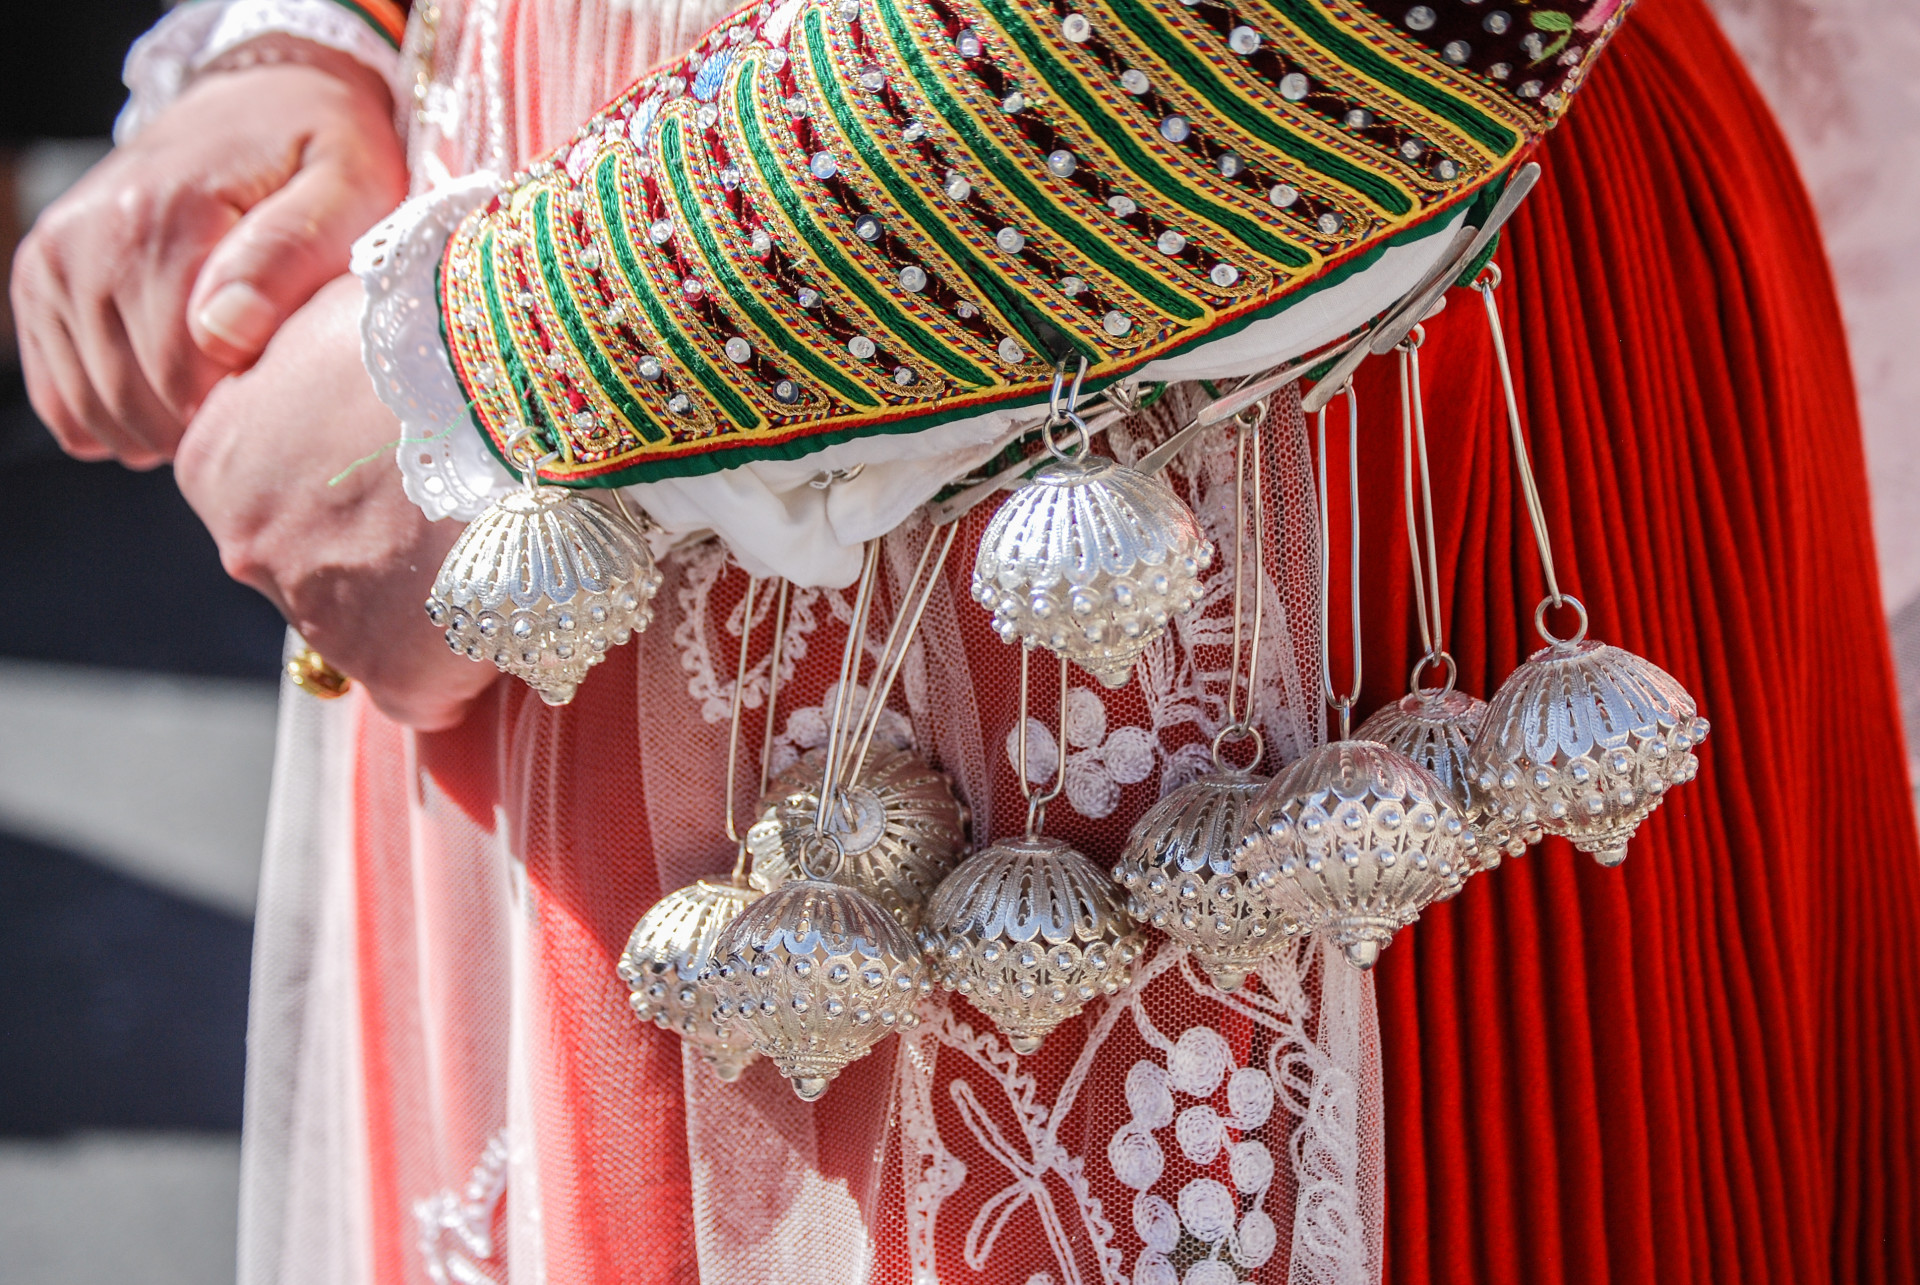 Vrouw in klederdracht Sardinië